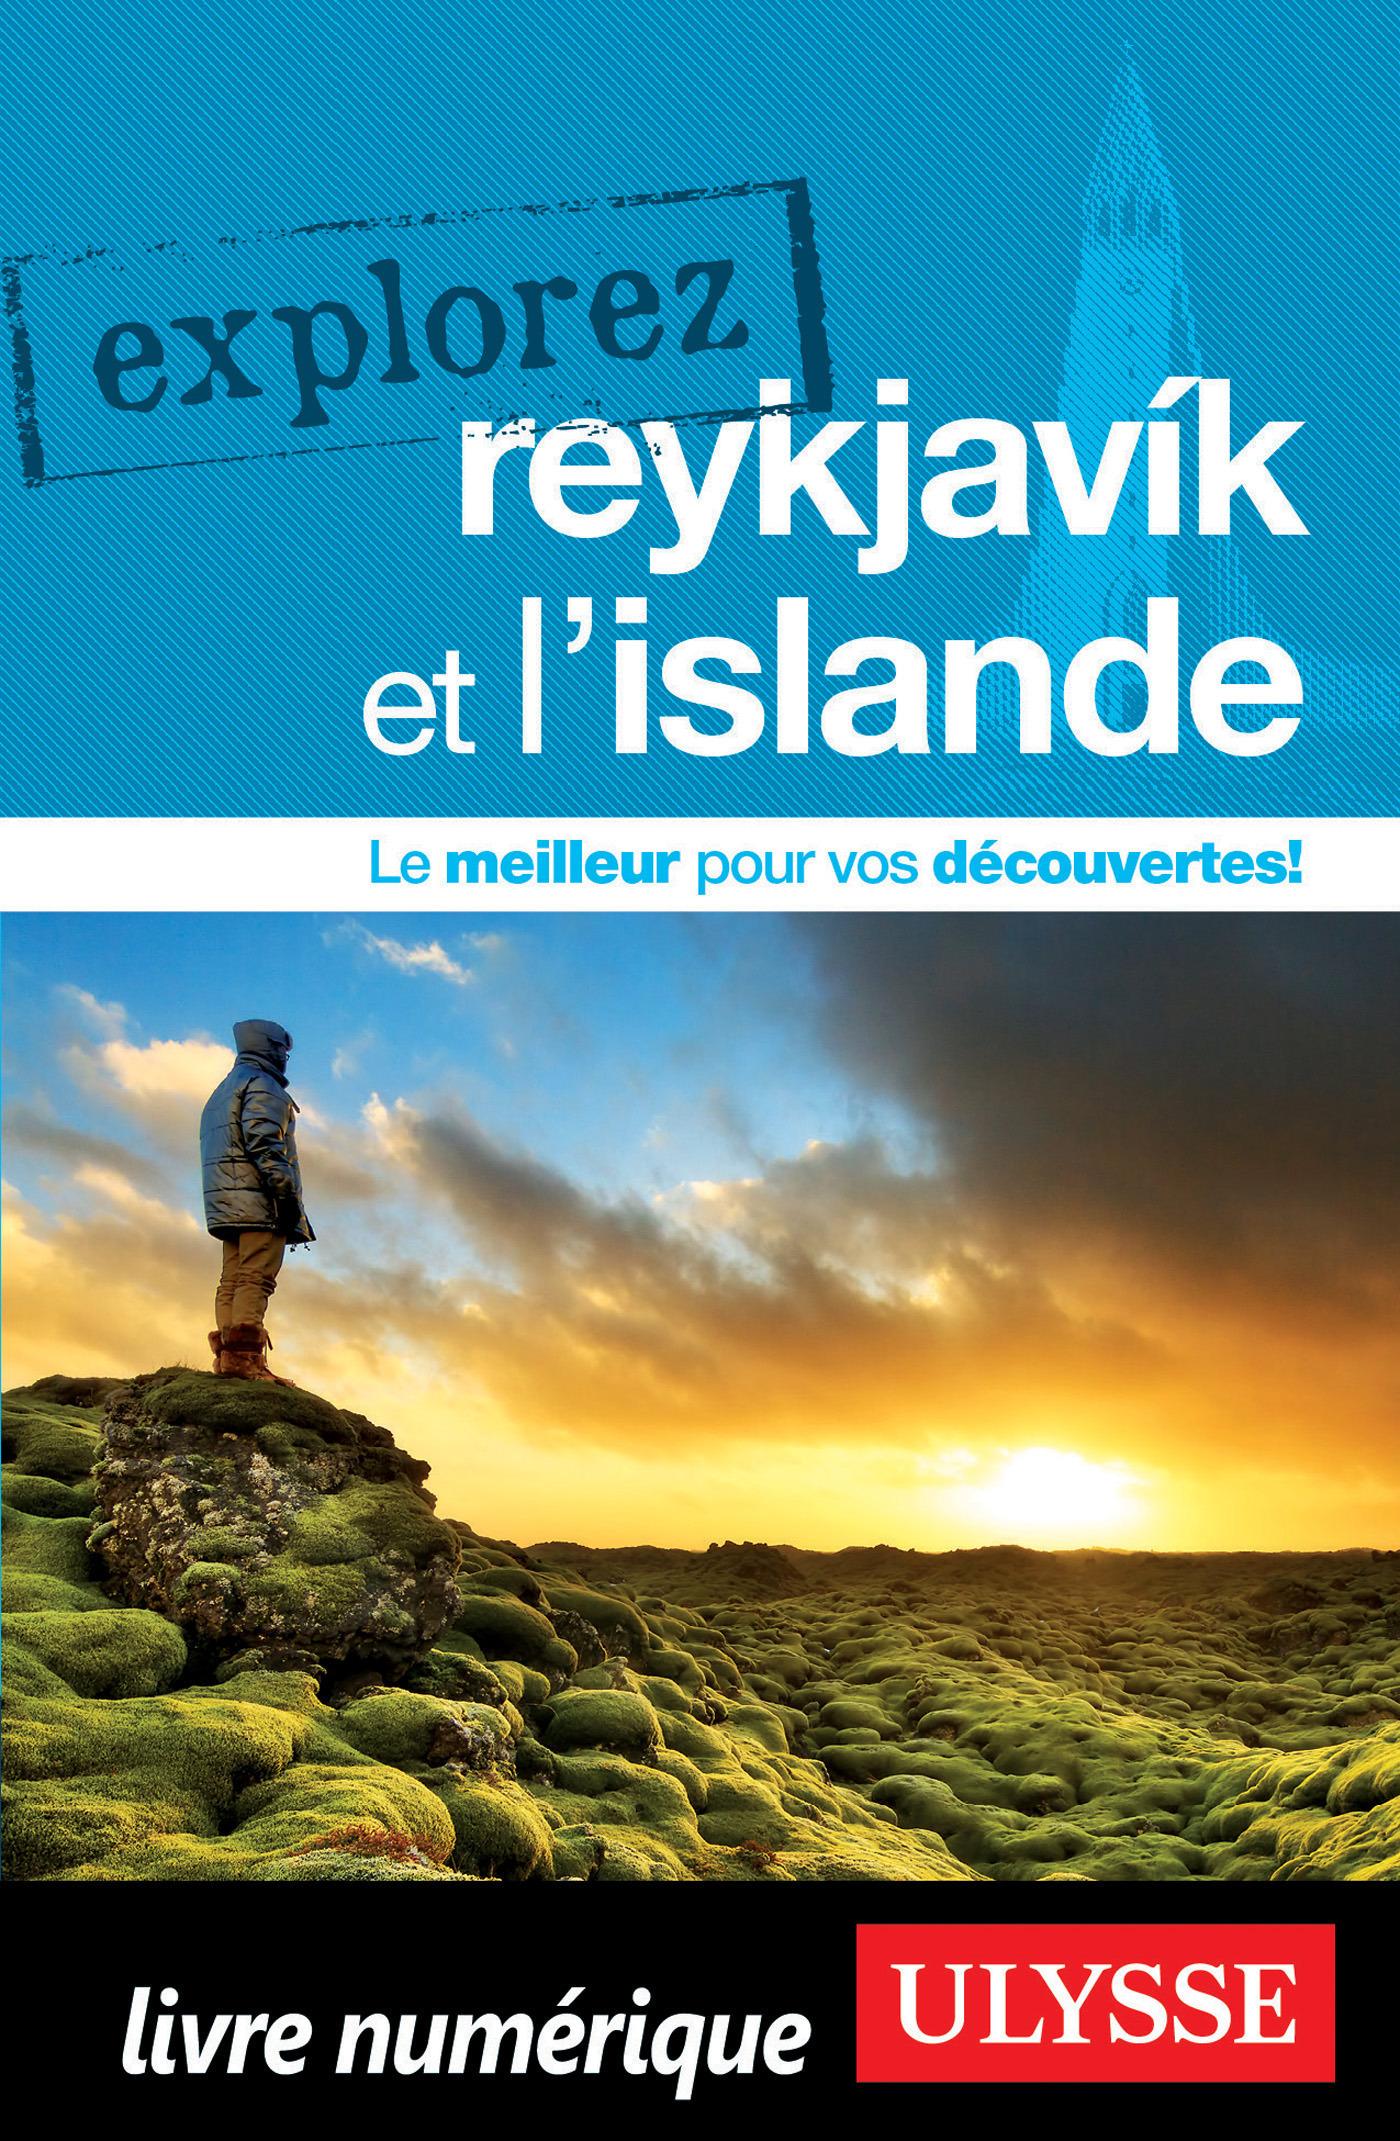 Explorez Reykjavik et l'Islande (ebook)